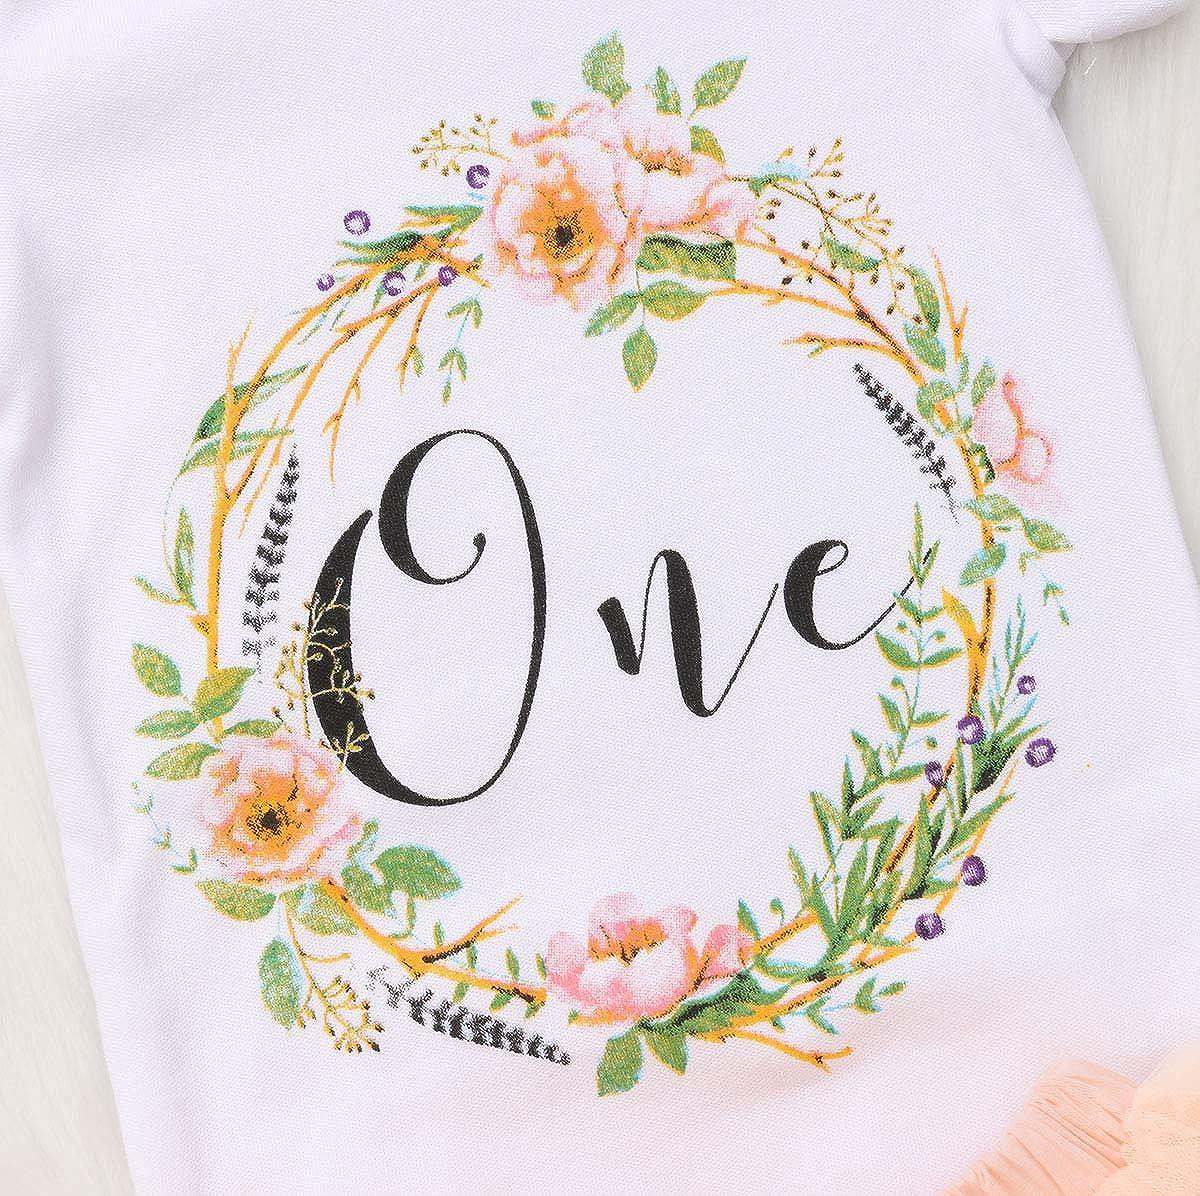 Baby Girls 1st Birthday Tutu Dress Outfit Short Sleeve Unicorn Romper+Lace Skirt+Headband 3Pcs Clothes